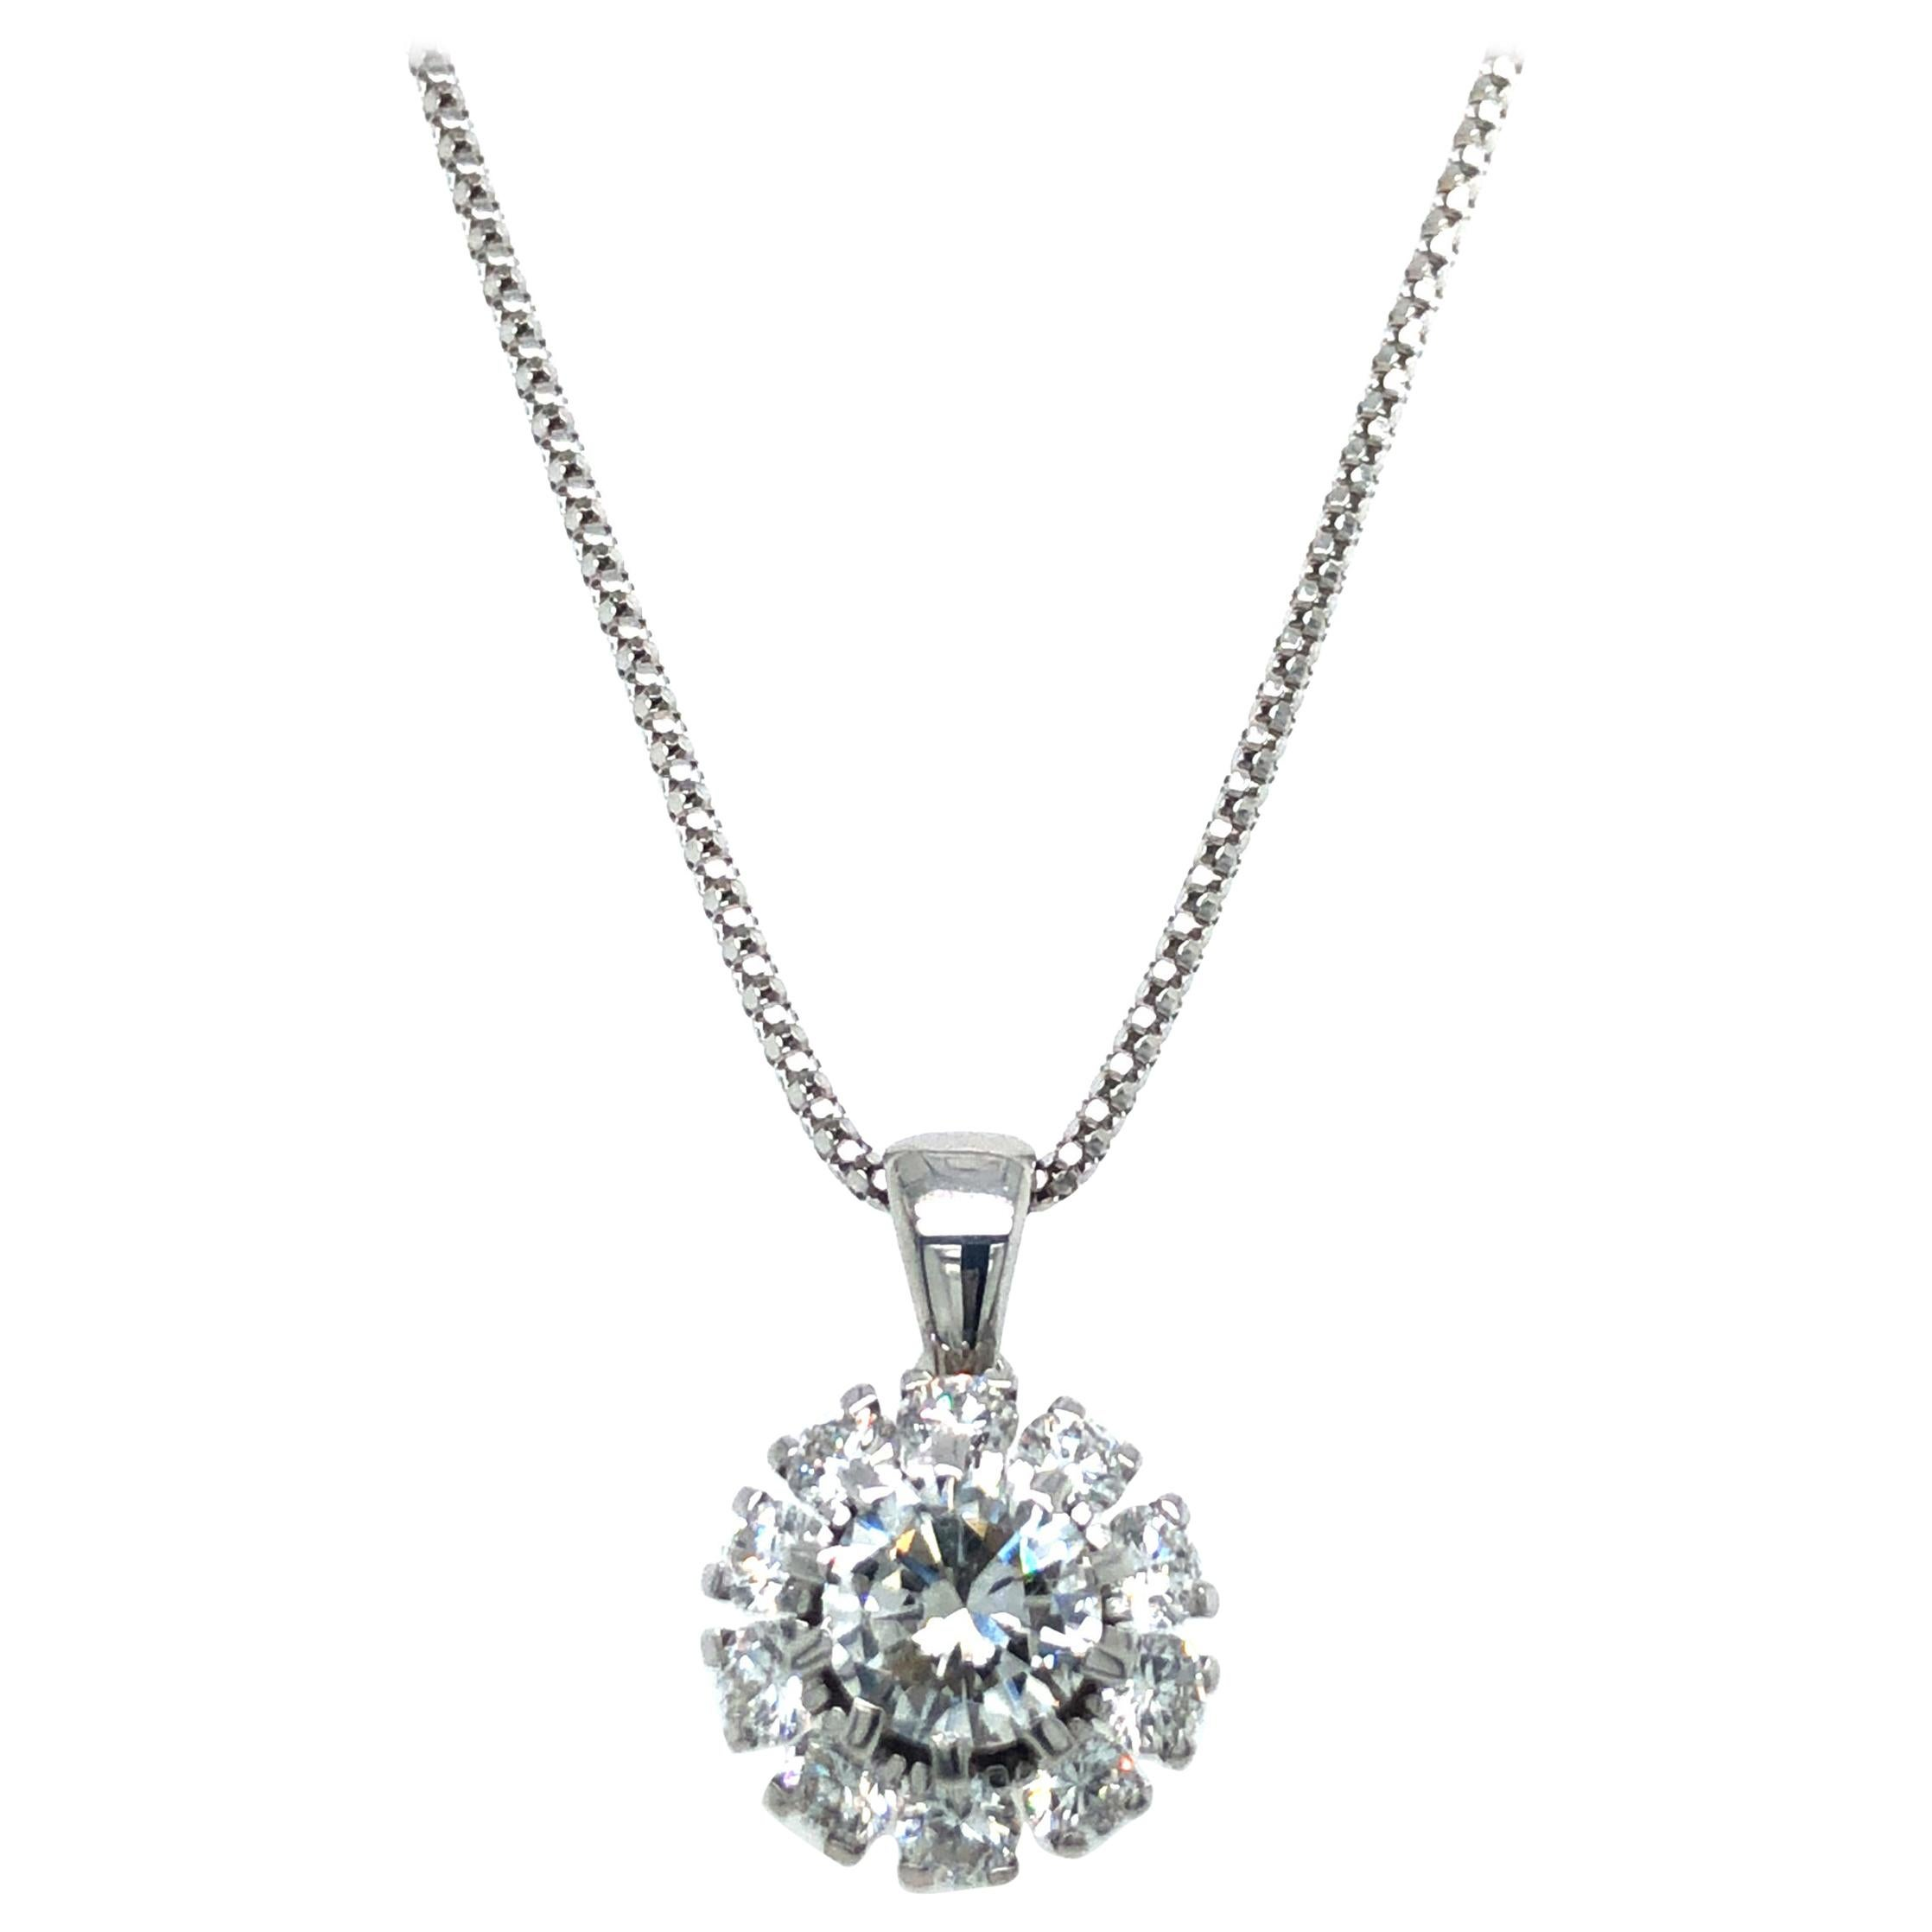 Diamond Pendant Necklace in 18 Karat White Gold